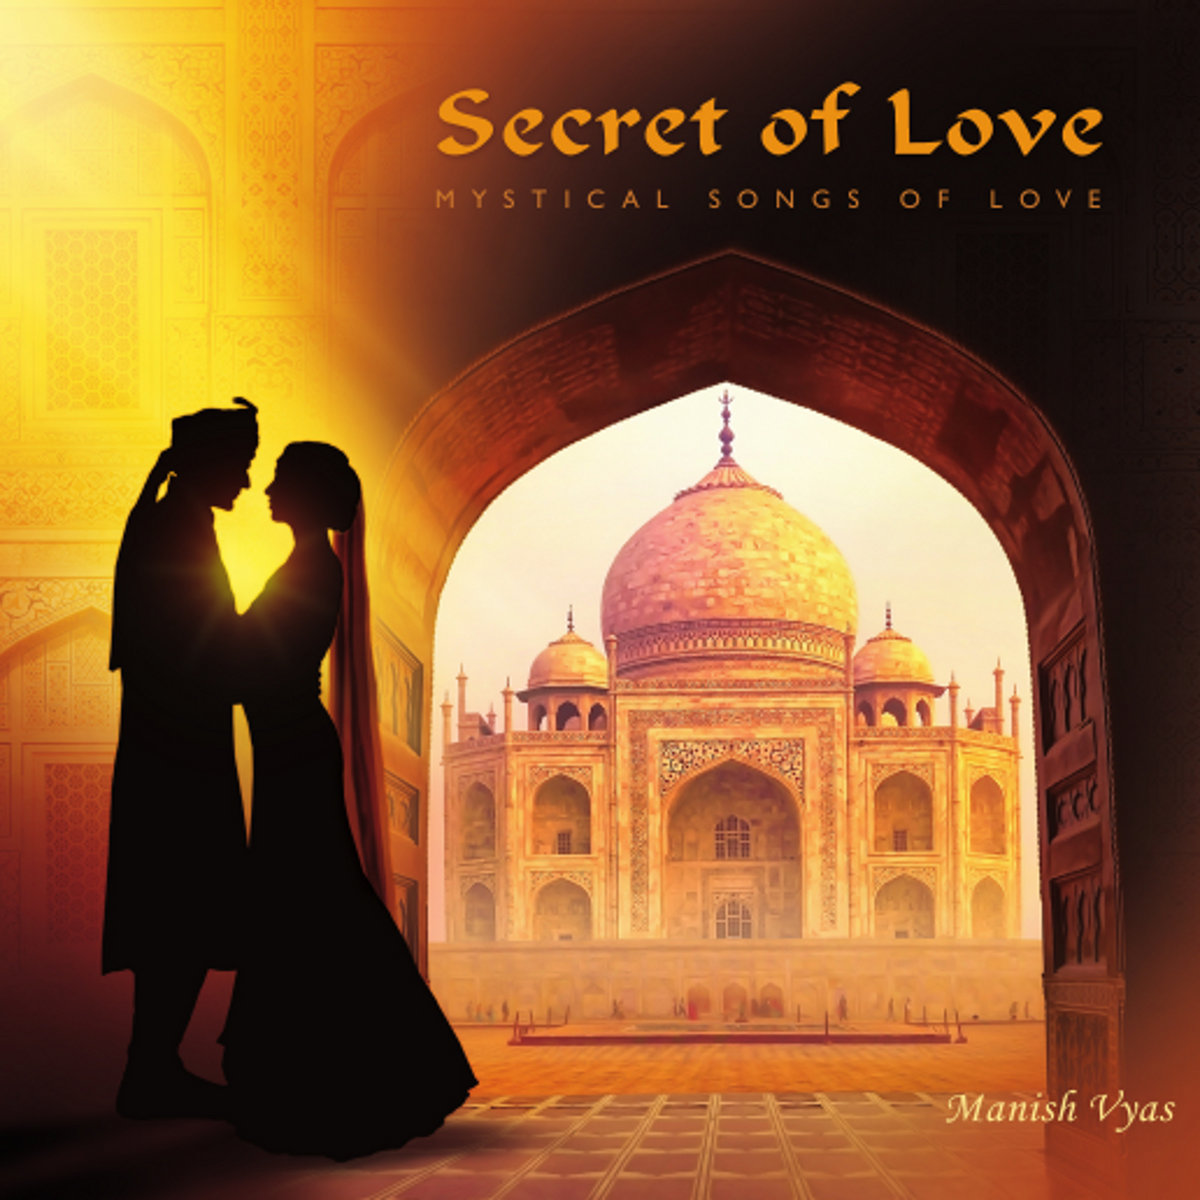 Secret of Love: Mystical Songs of Love | White Swan Records